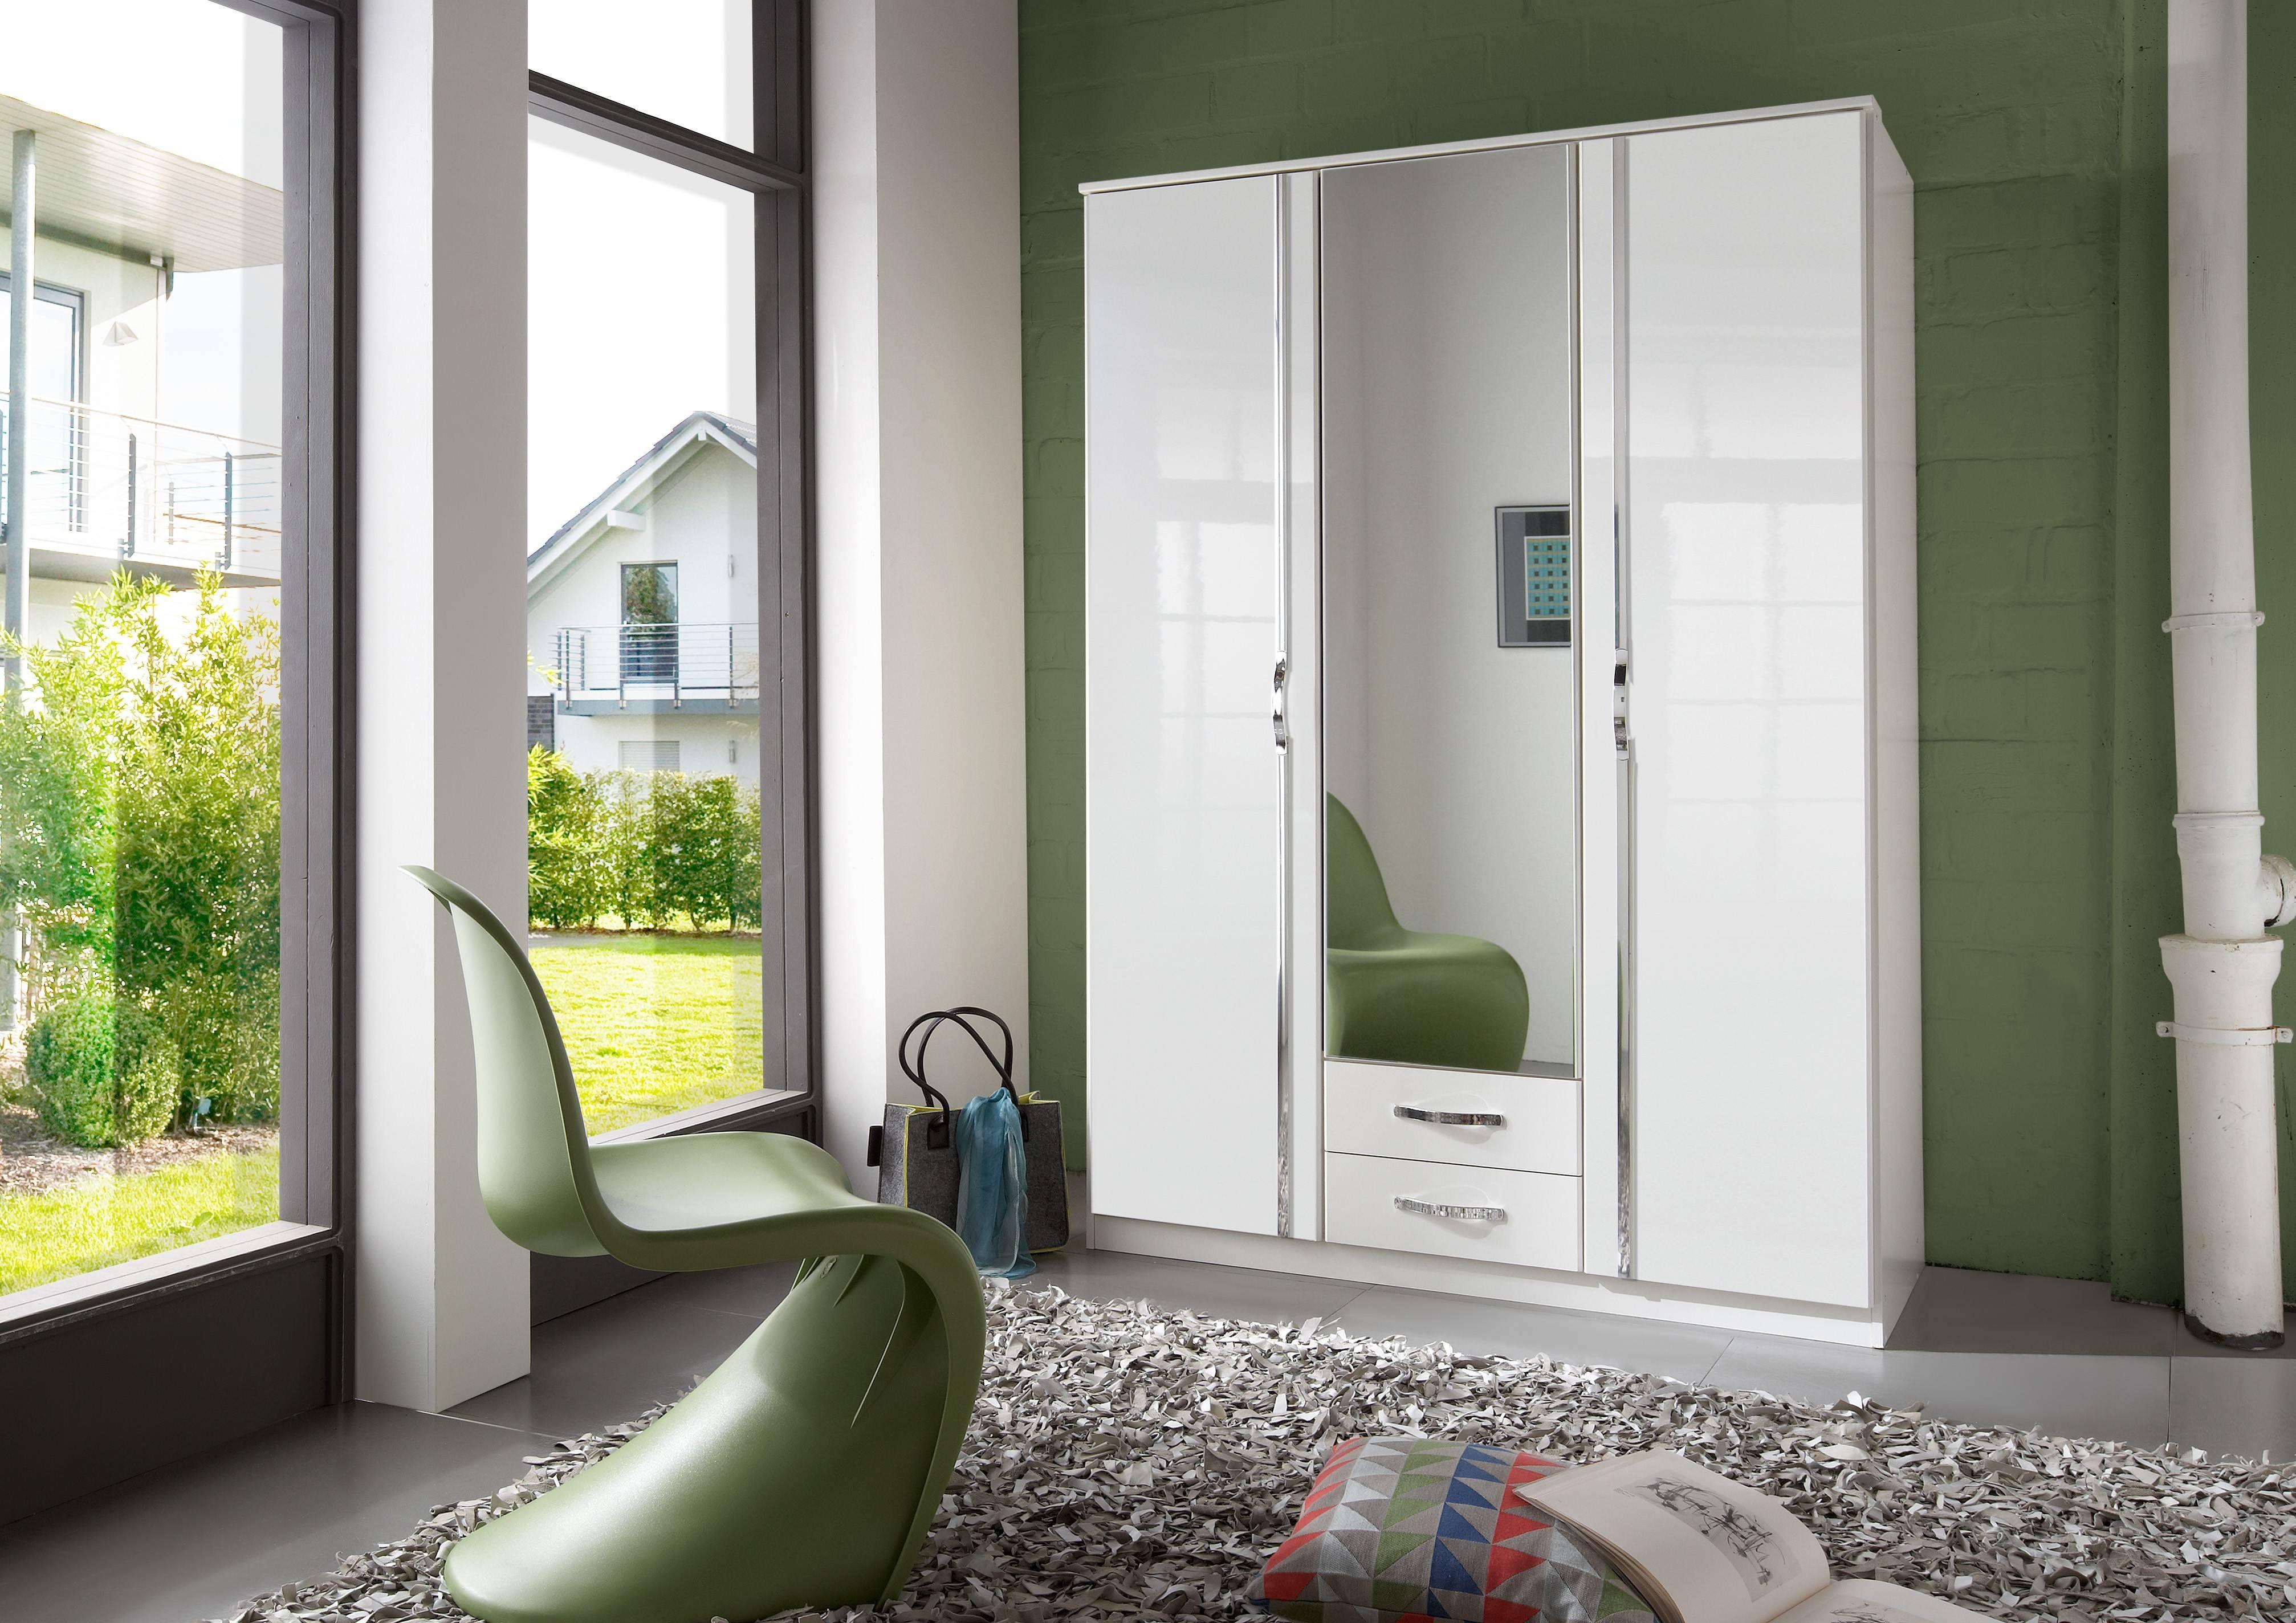 Slumberhaus 'trio' White Gloss, Chrome & Mirror 3 Door 2 Drawer in Wardrobes 3 Door With Mirror (Image 14 of 15)